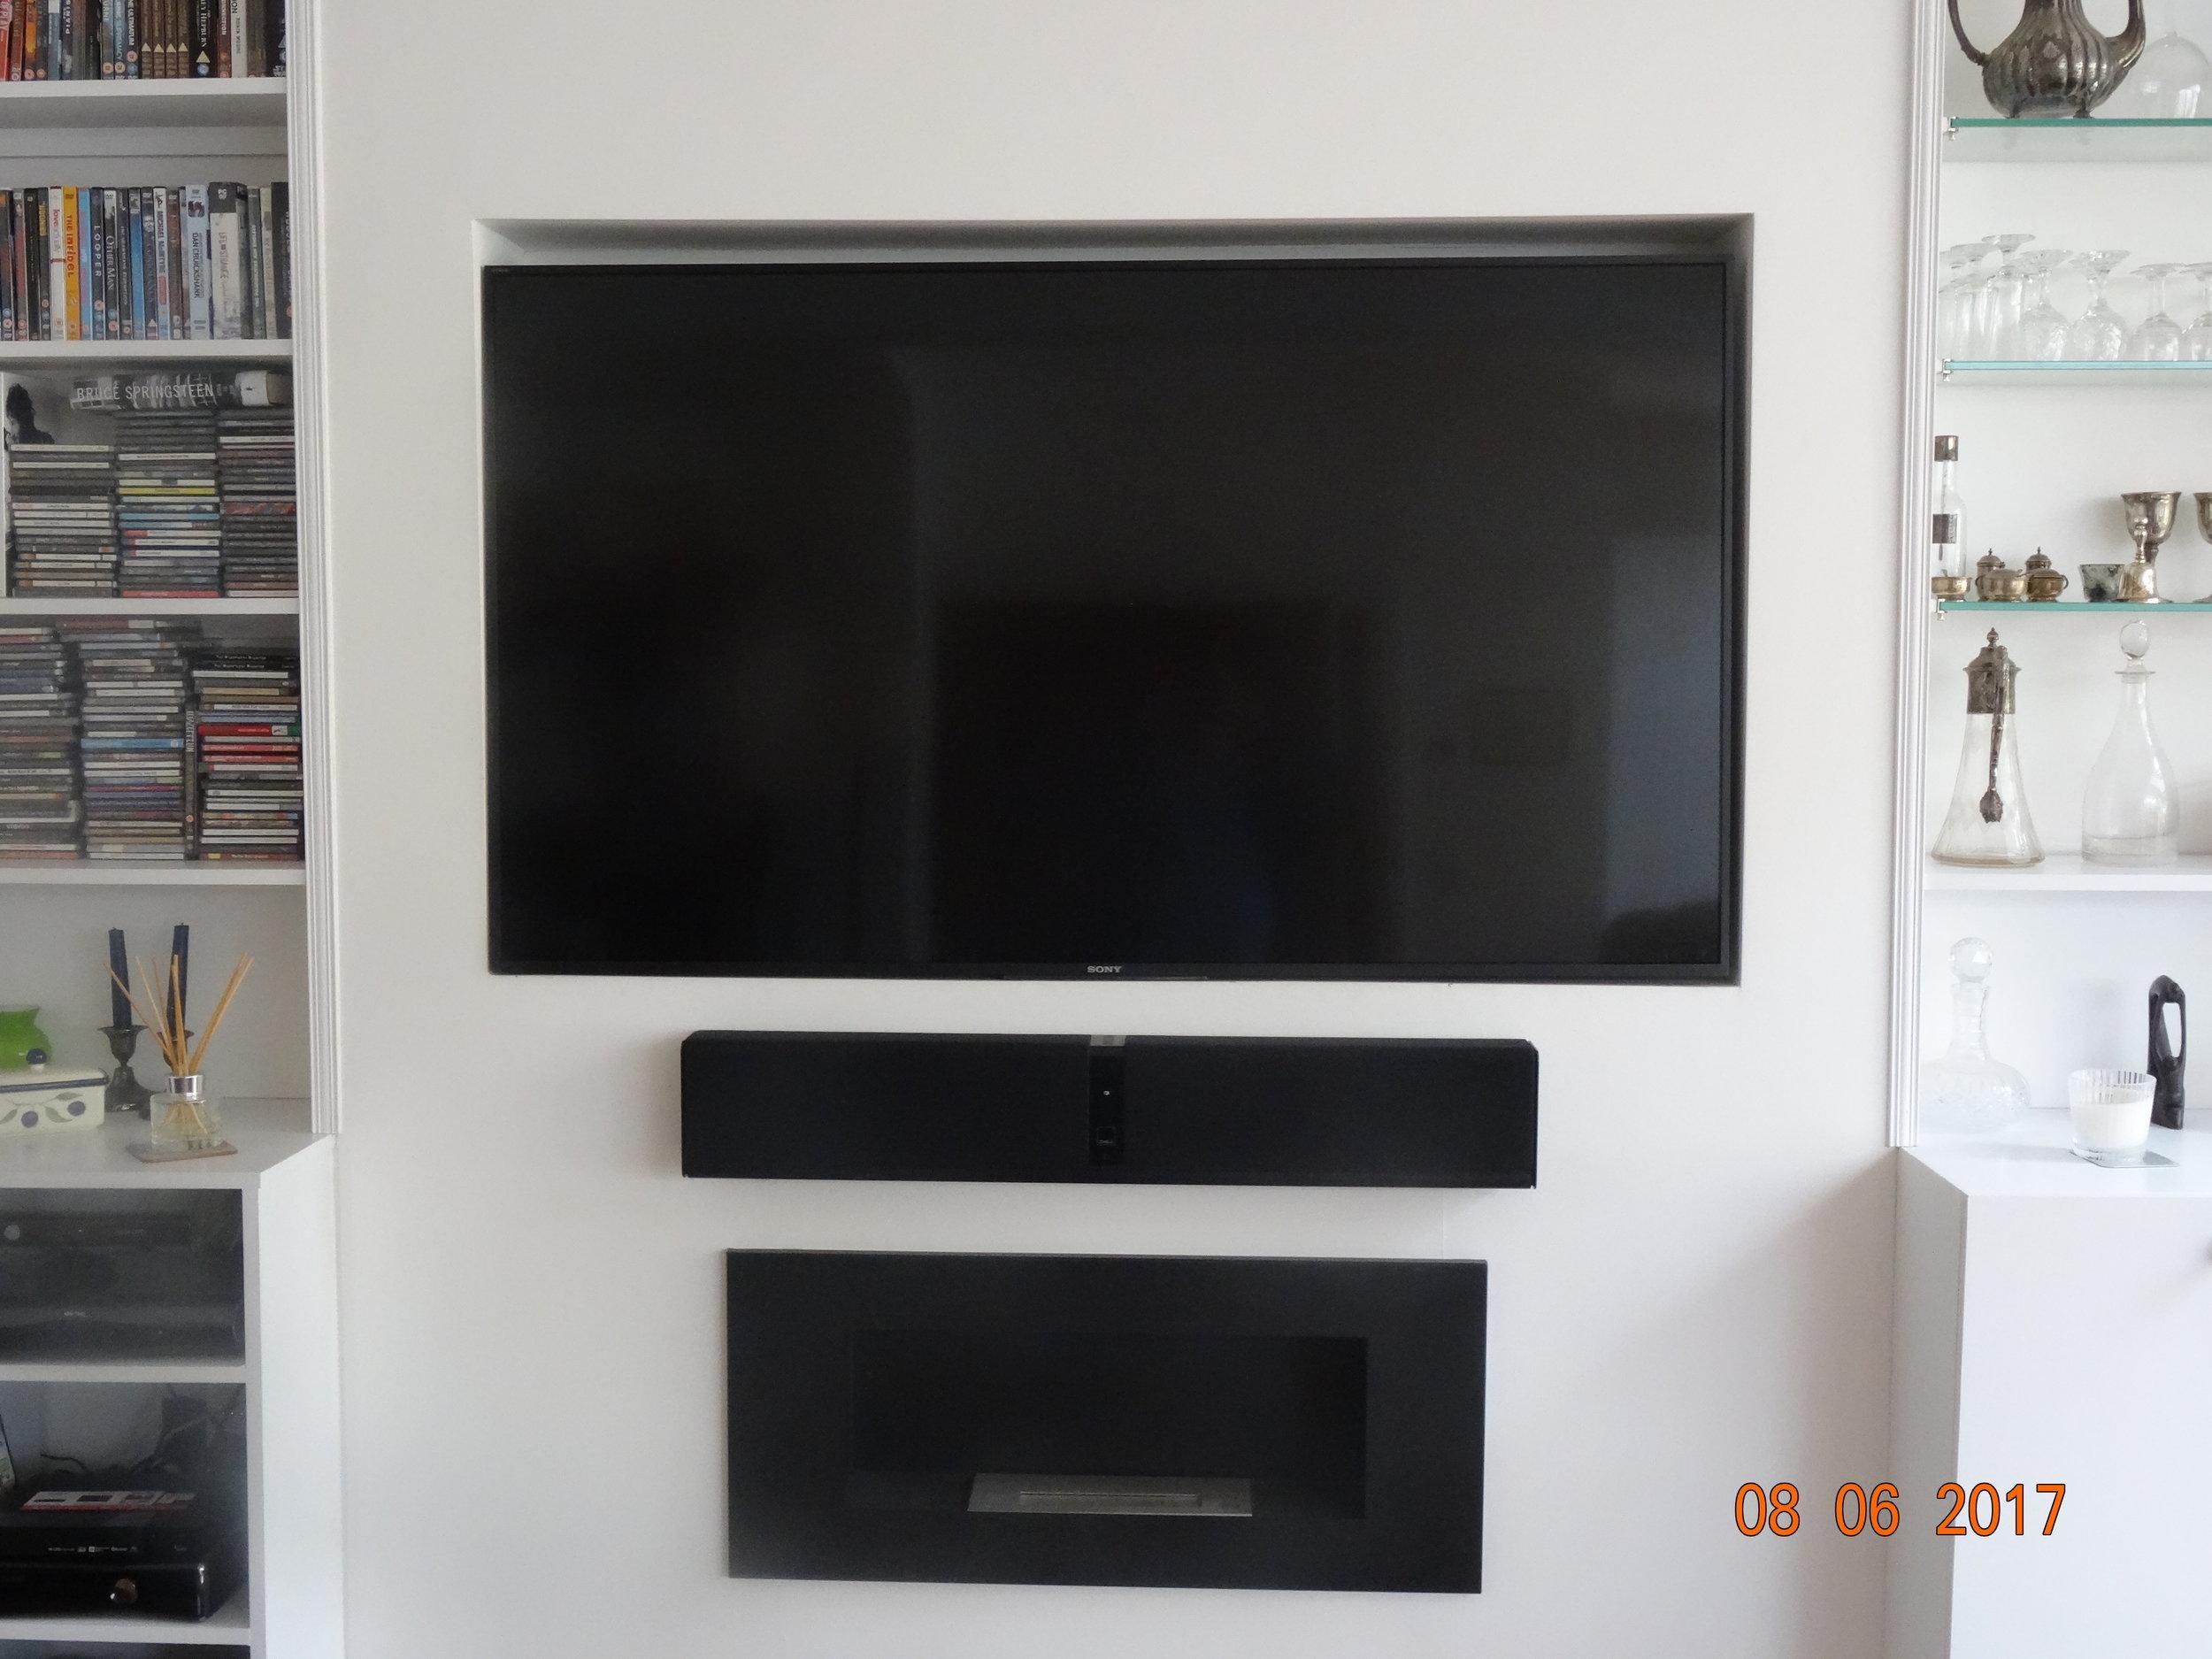 TV and sound bar installation